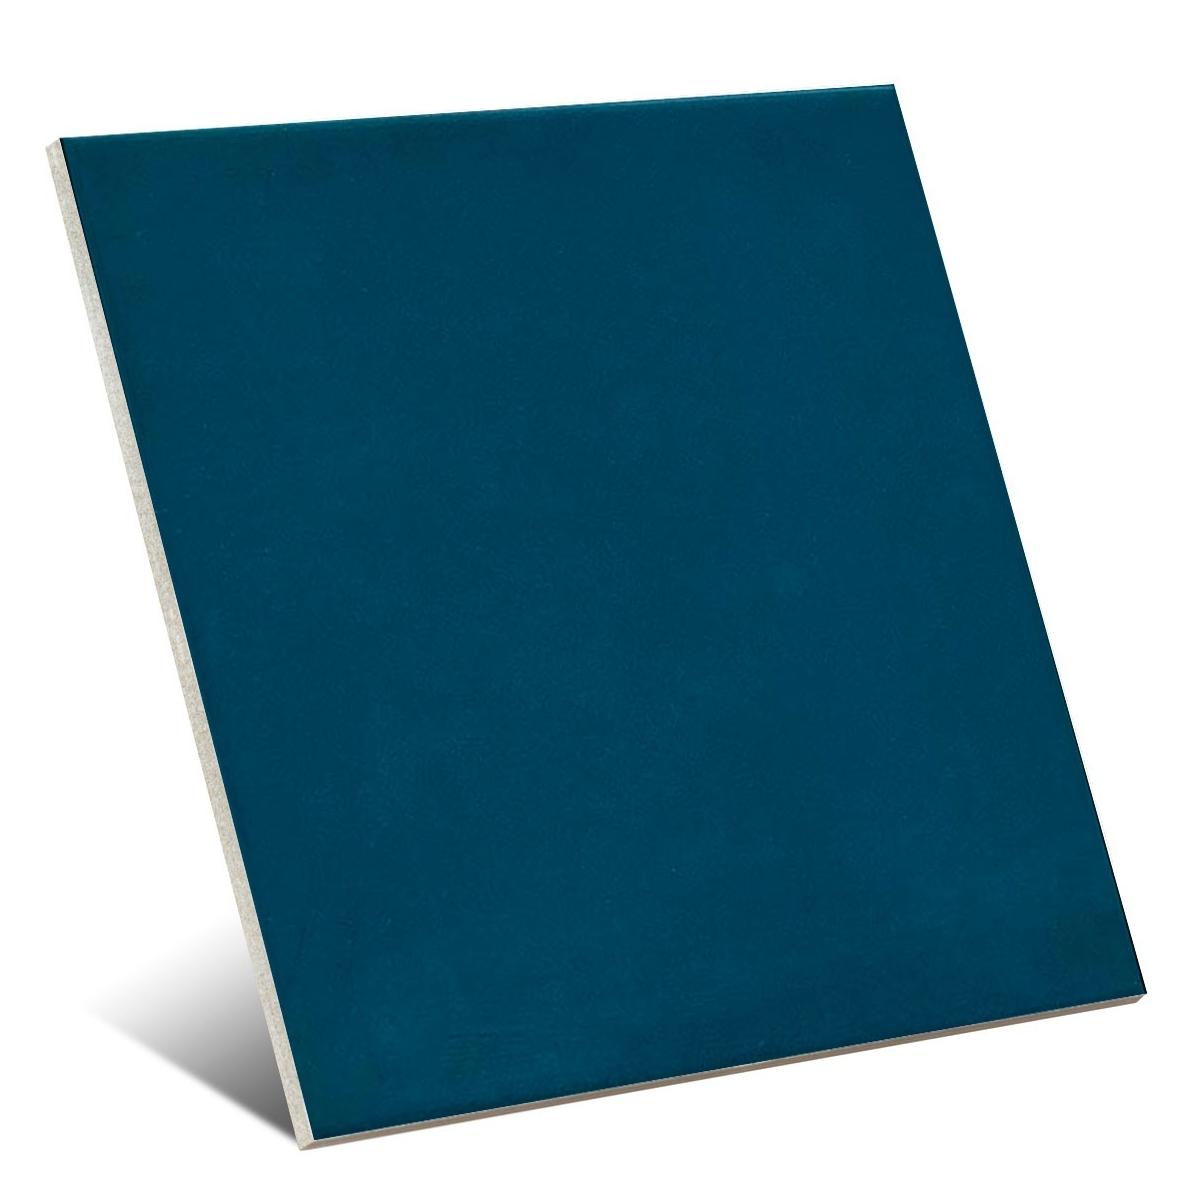 Base 1900 Azul 20x20 (m2)